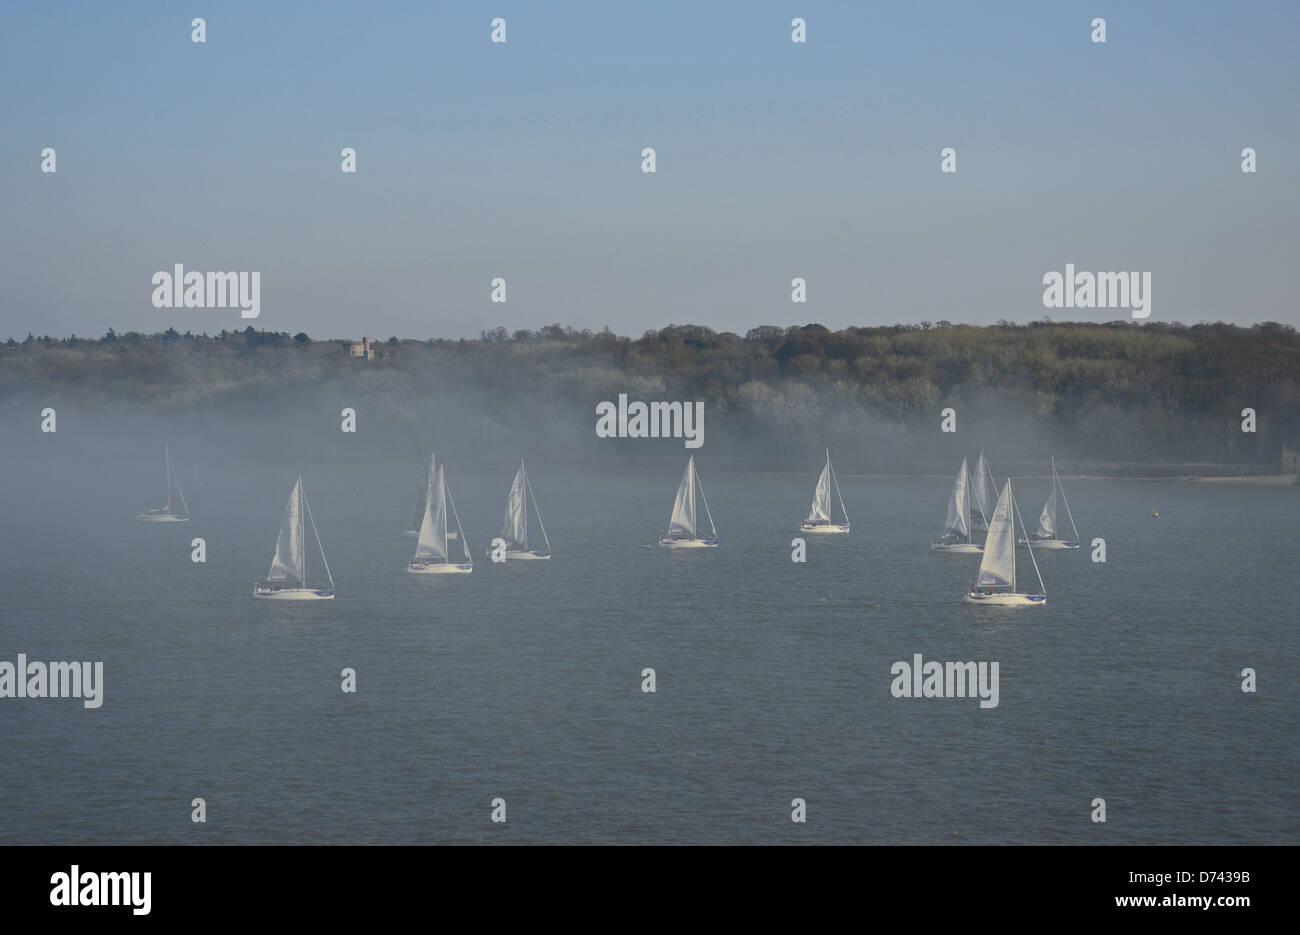 Yacht race in harbour mist, Port of Southampton, Southampton, Hampshire, England, United Kingdom - Stock Image